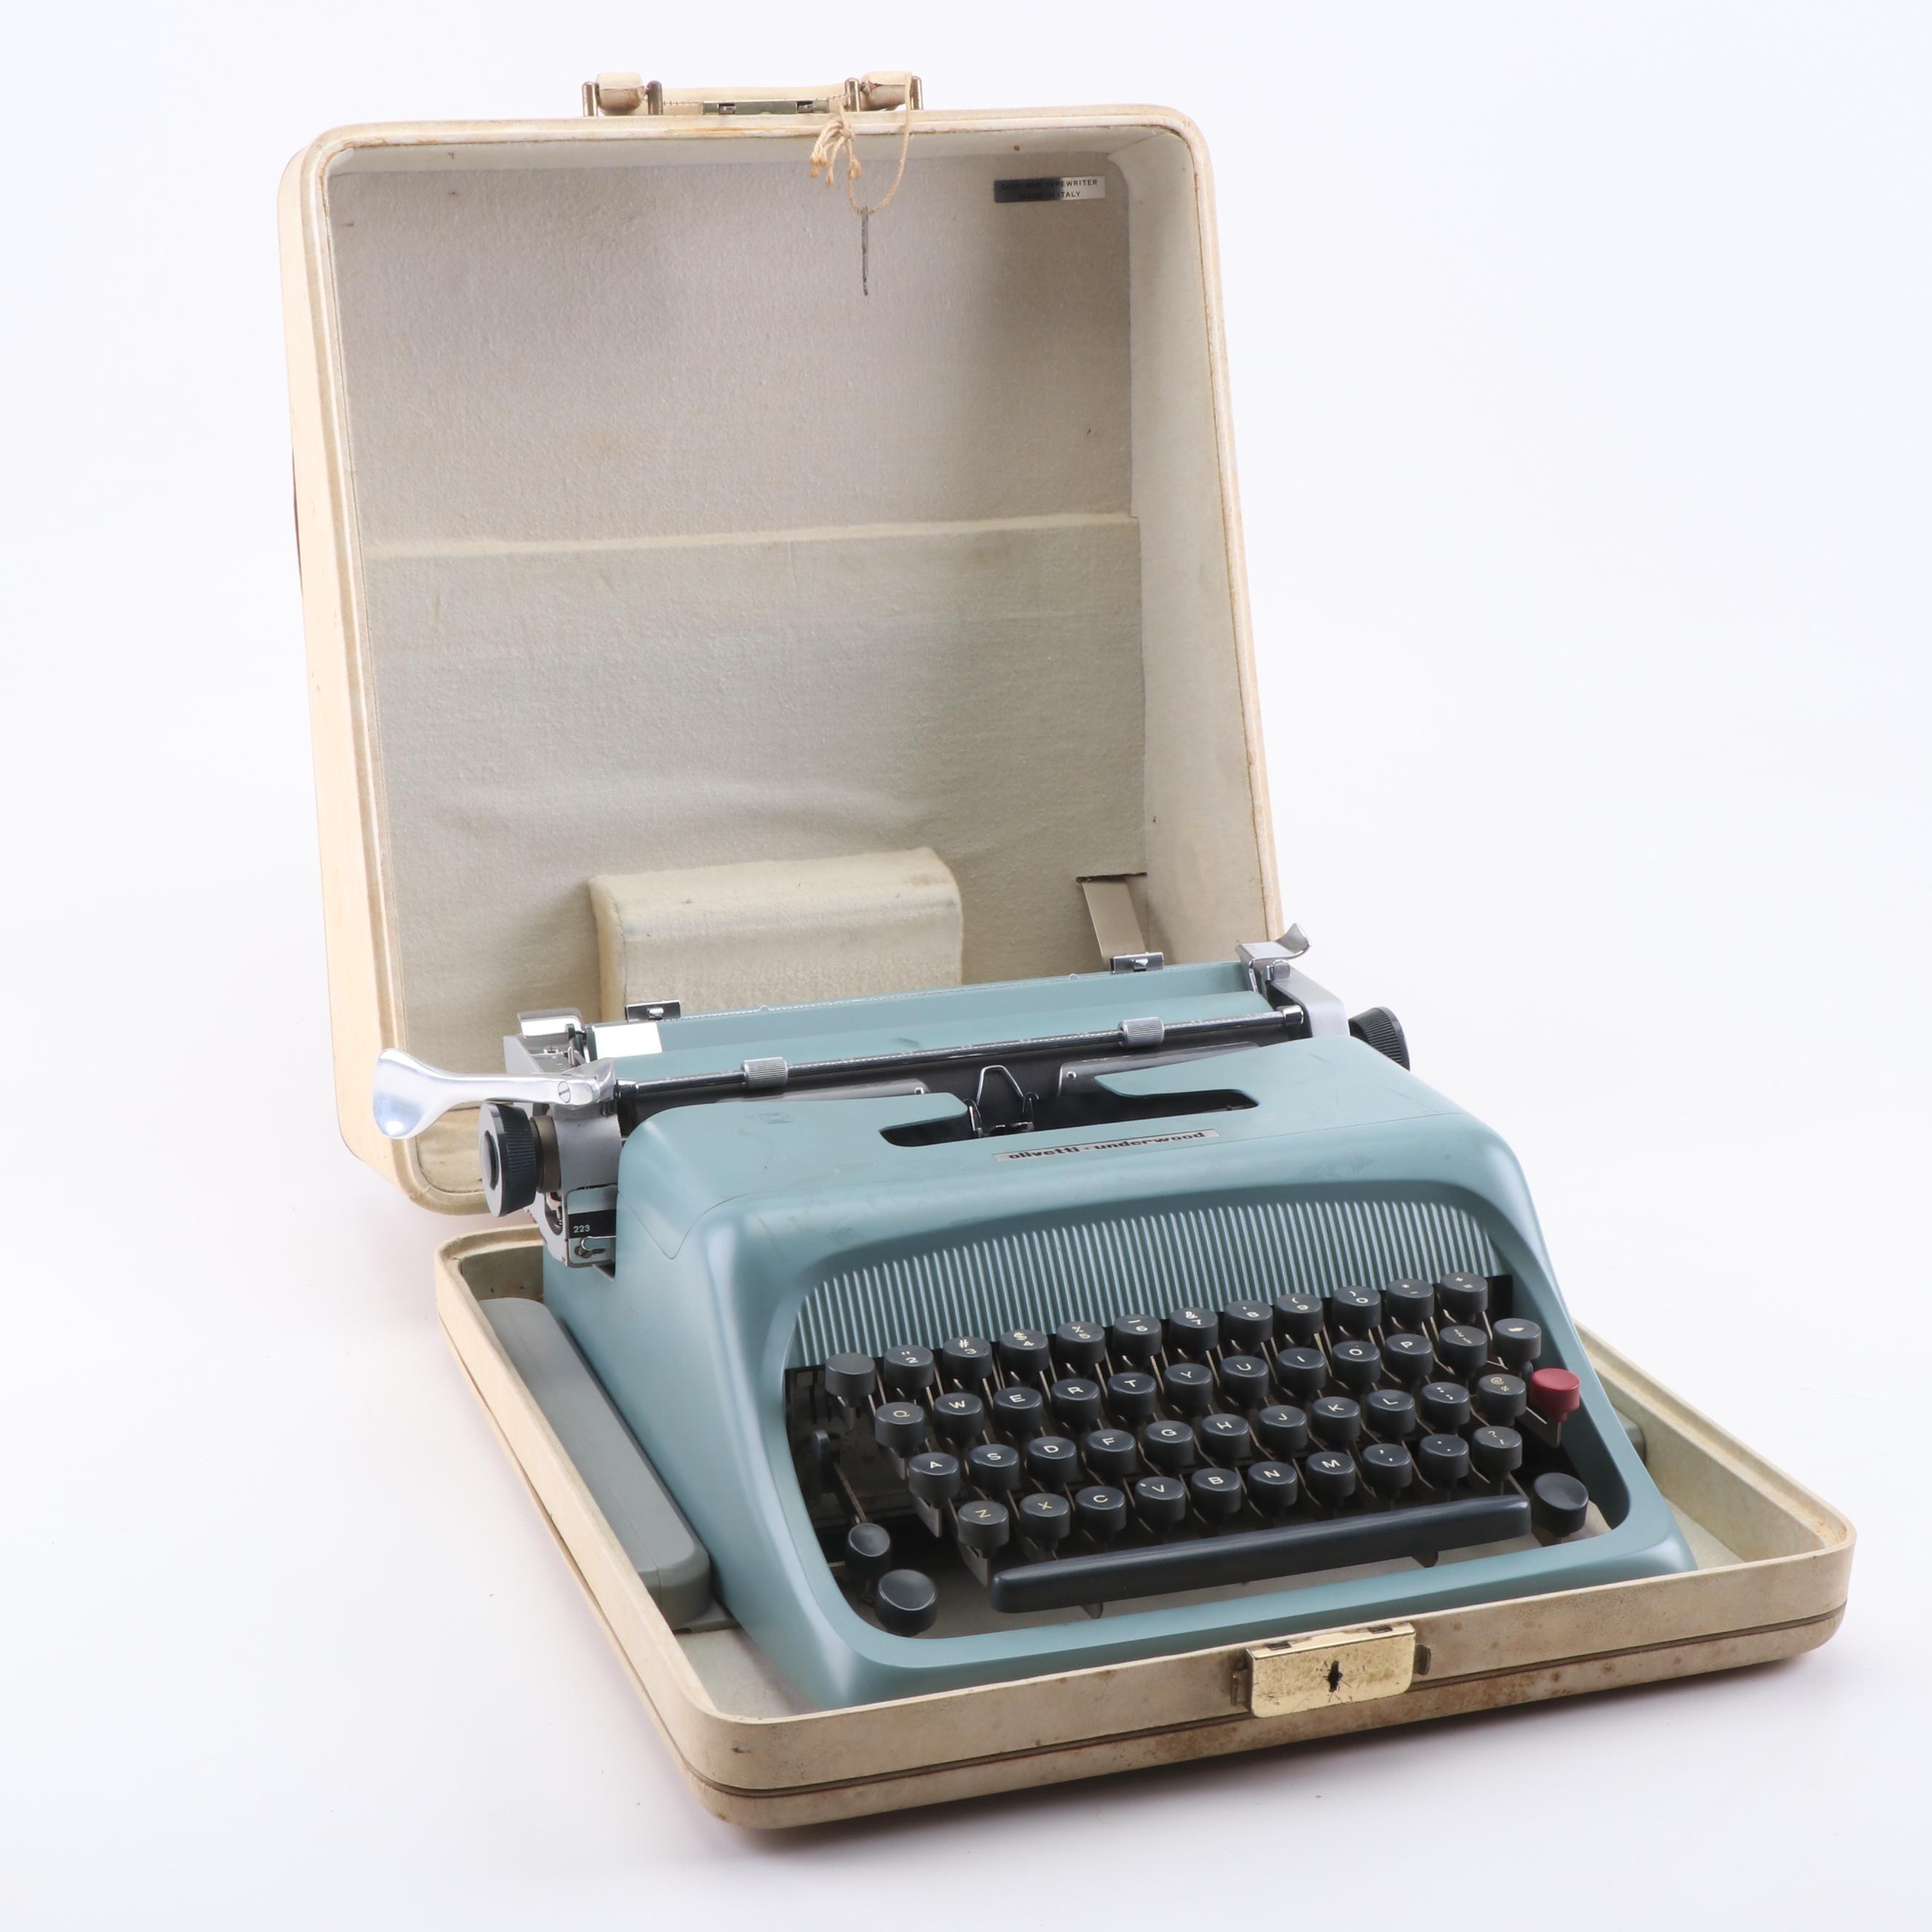 Olivetti-Underwood Typewriter with Case, circa 1960